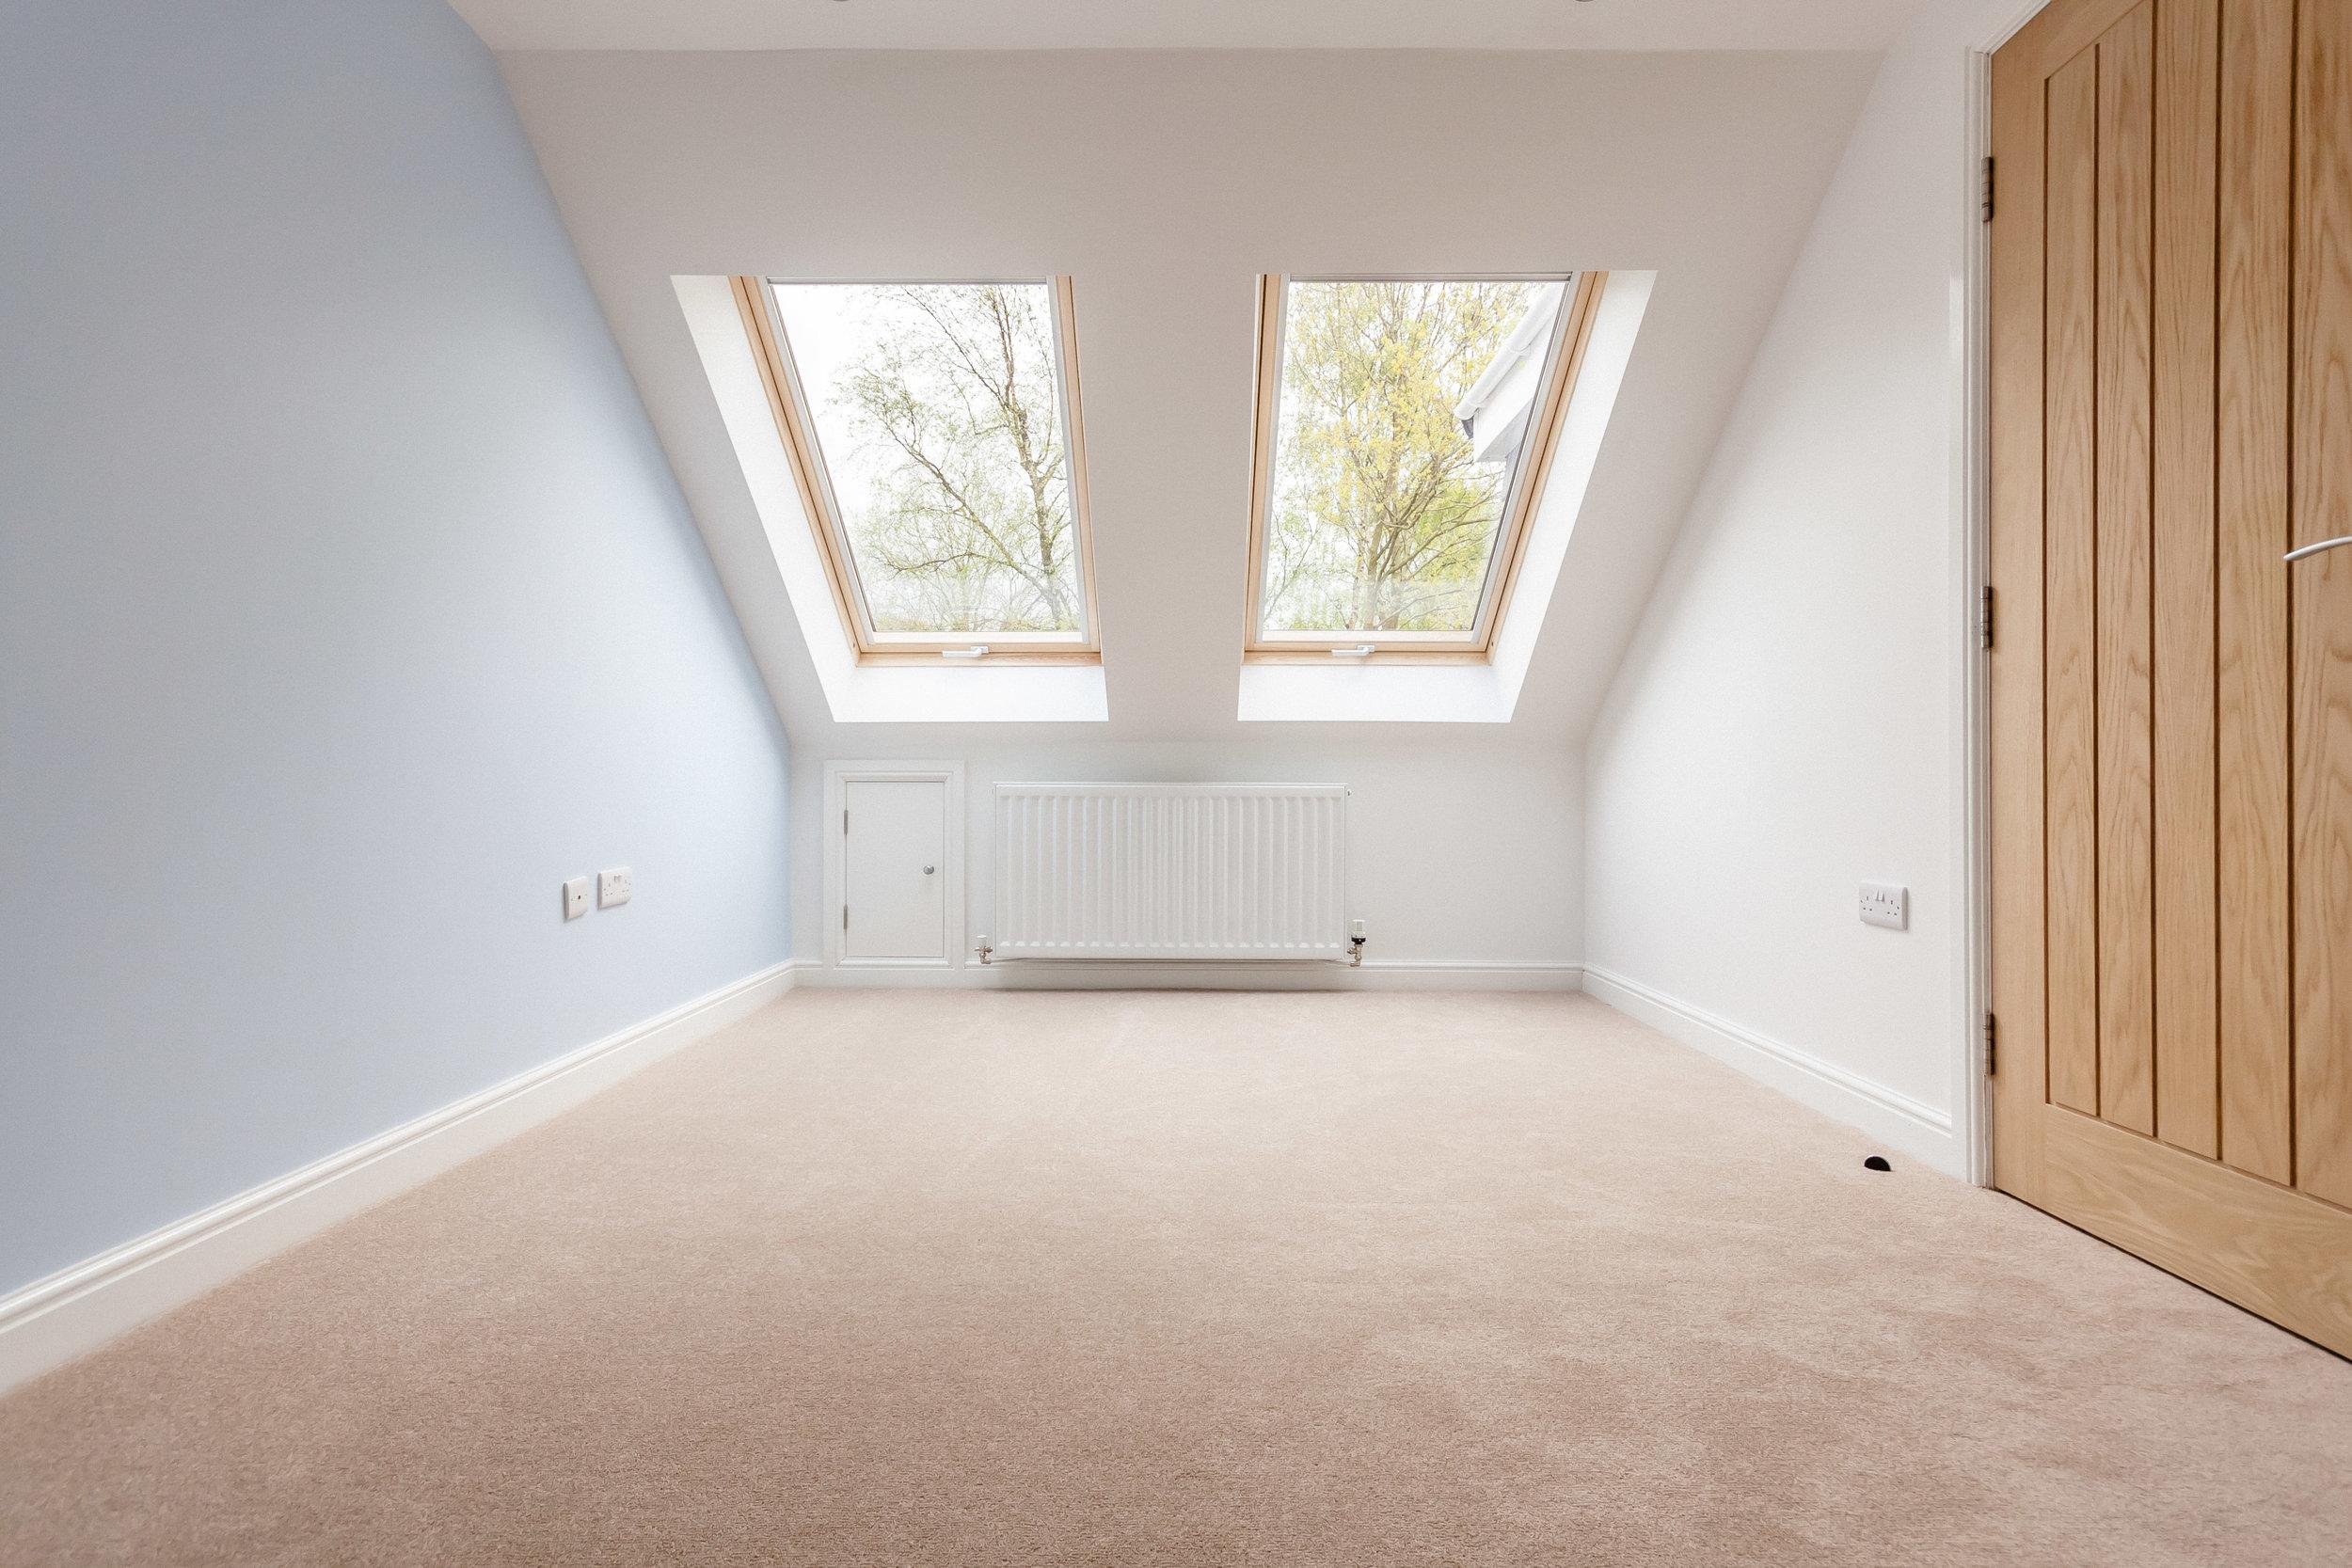 PropertyPhotographs-0361.jpg